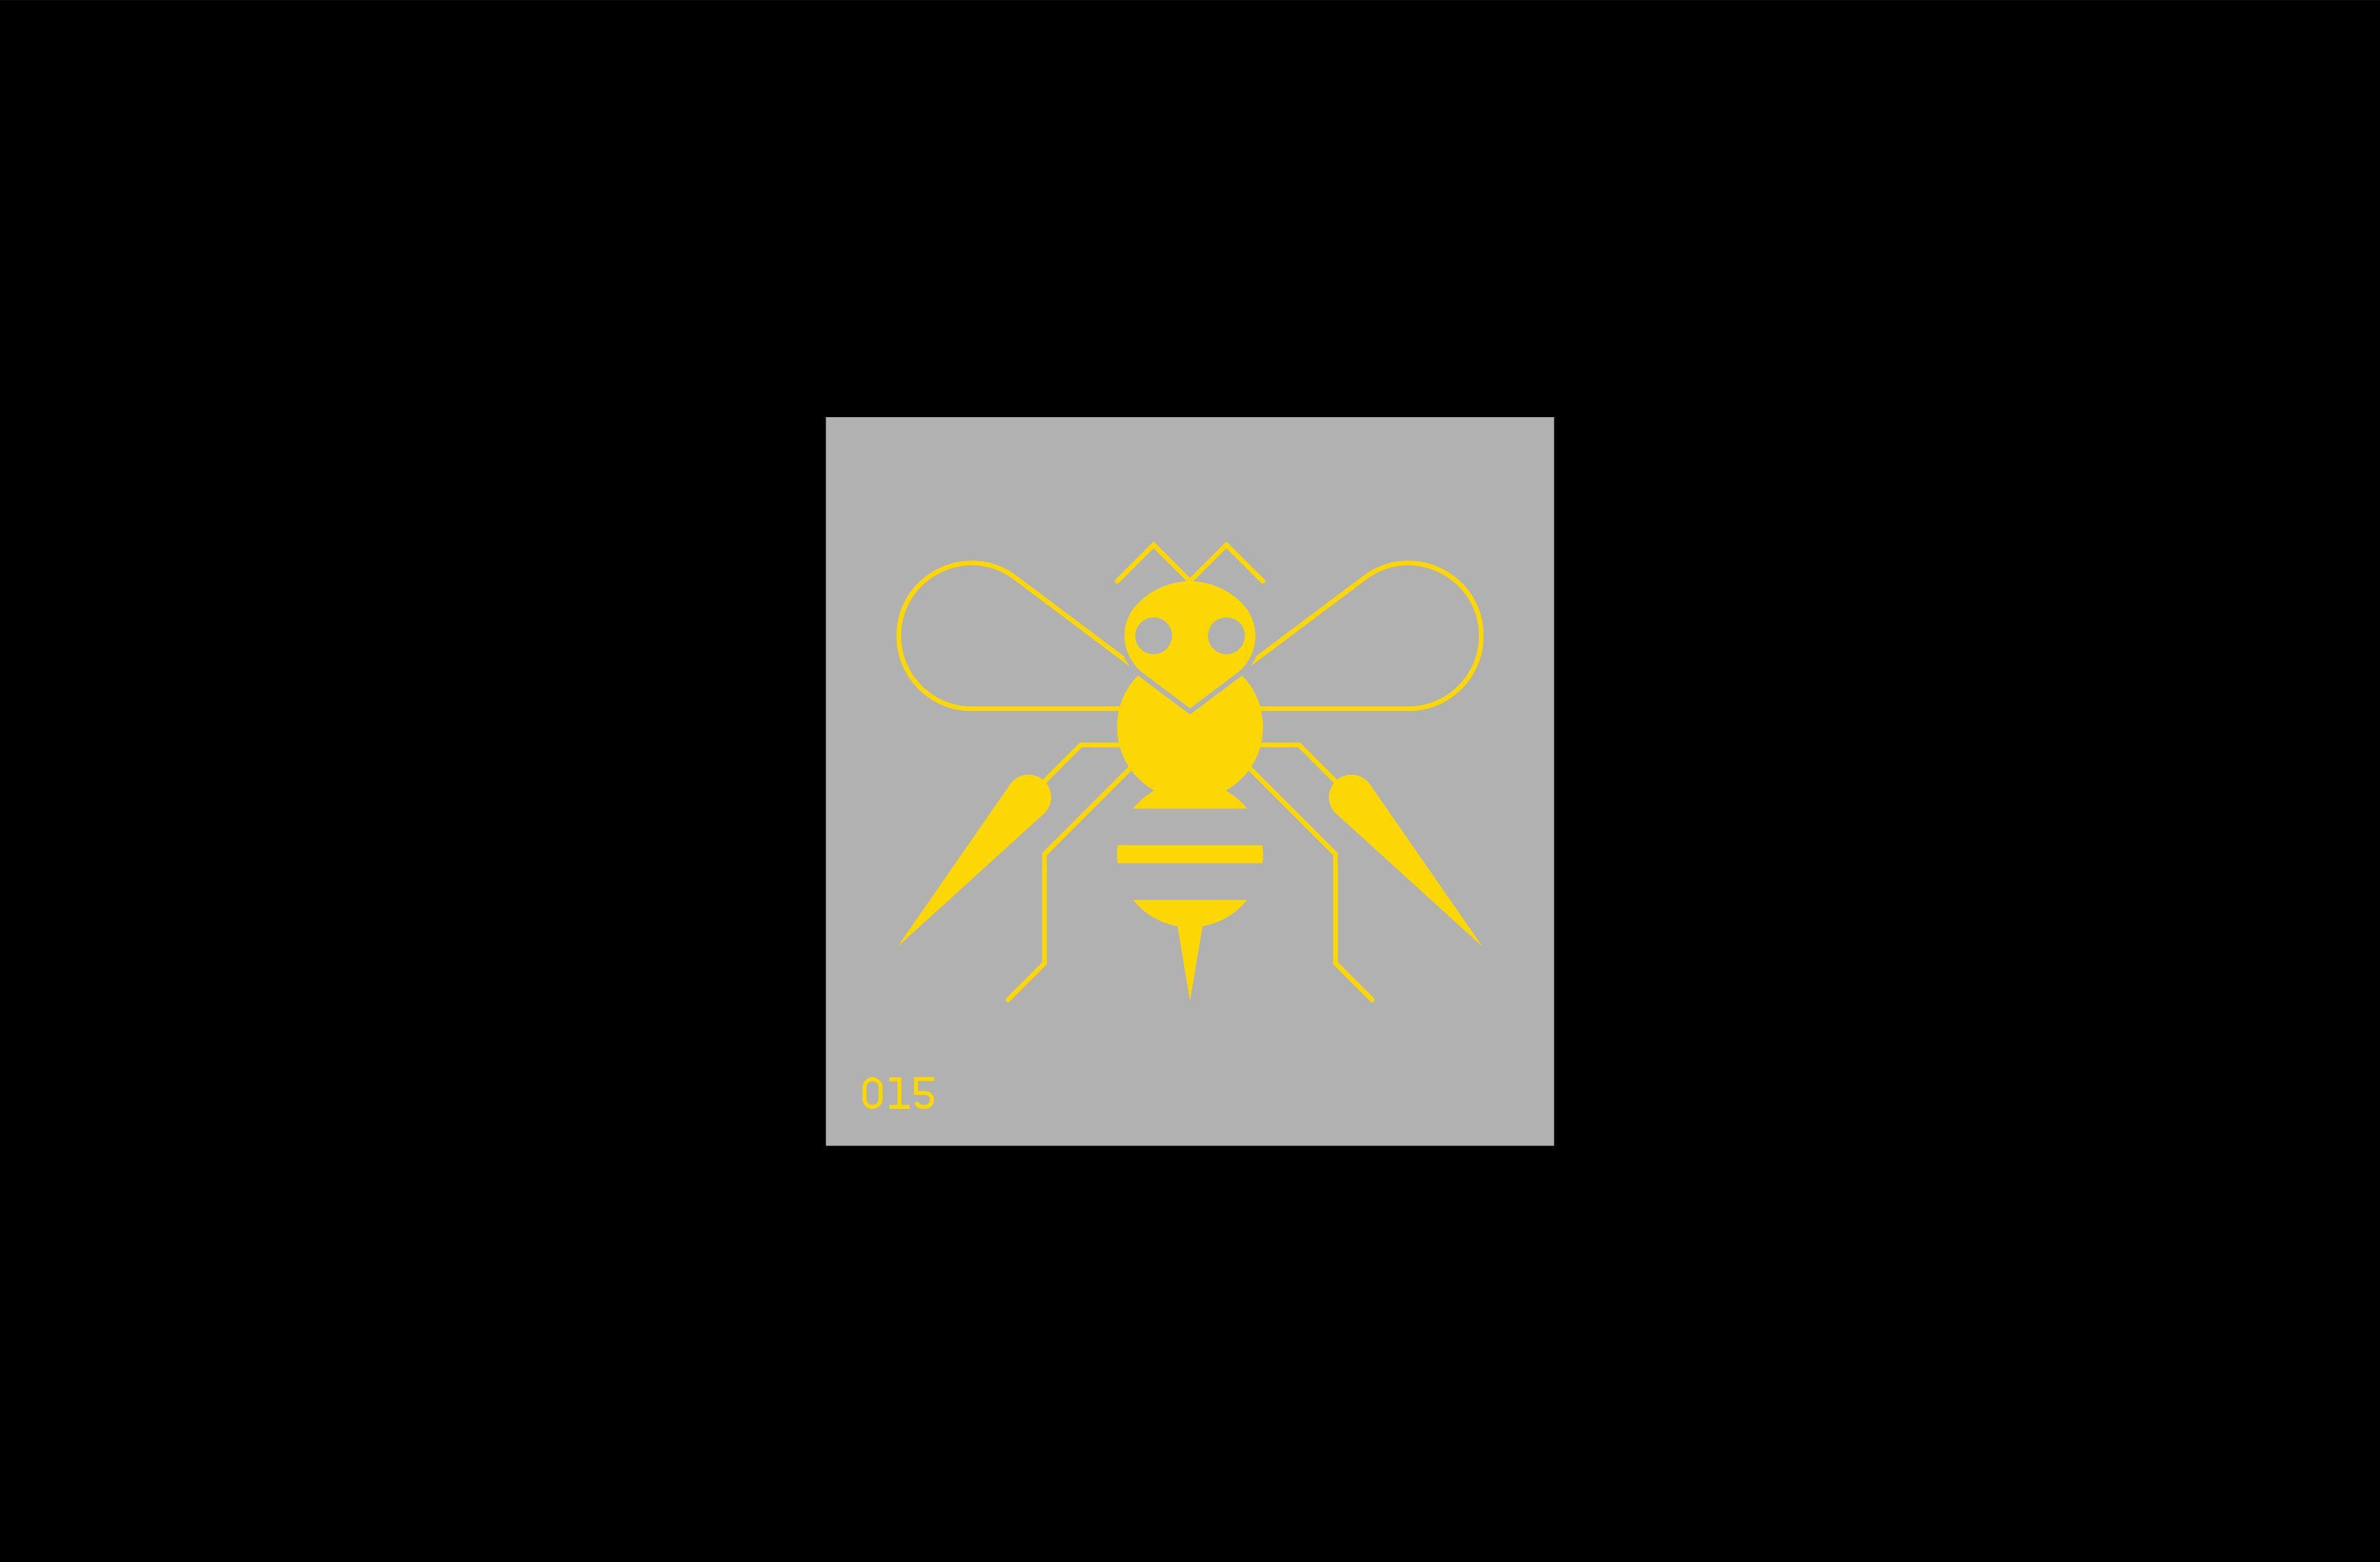 PM151-beedrill